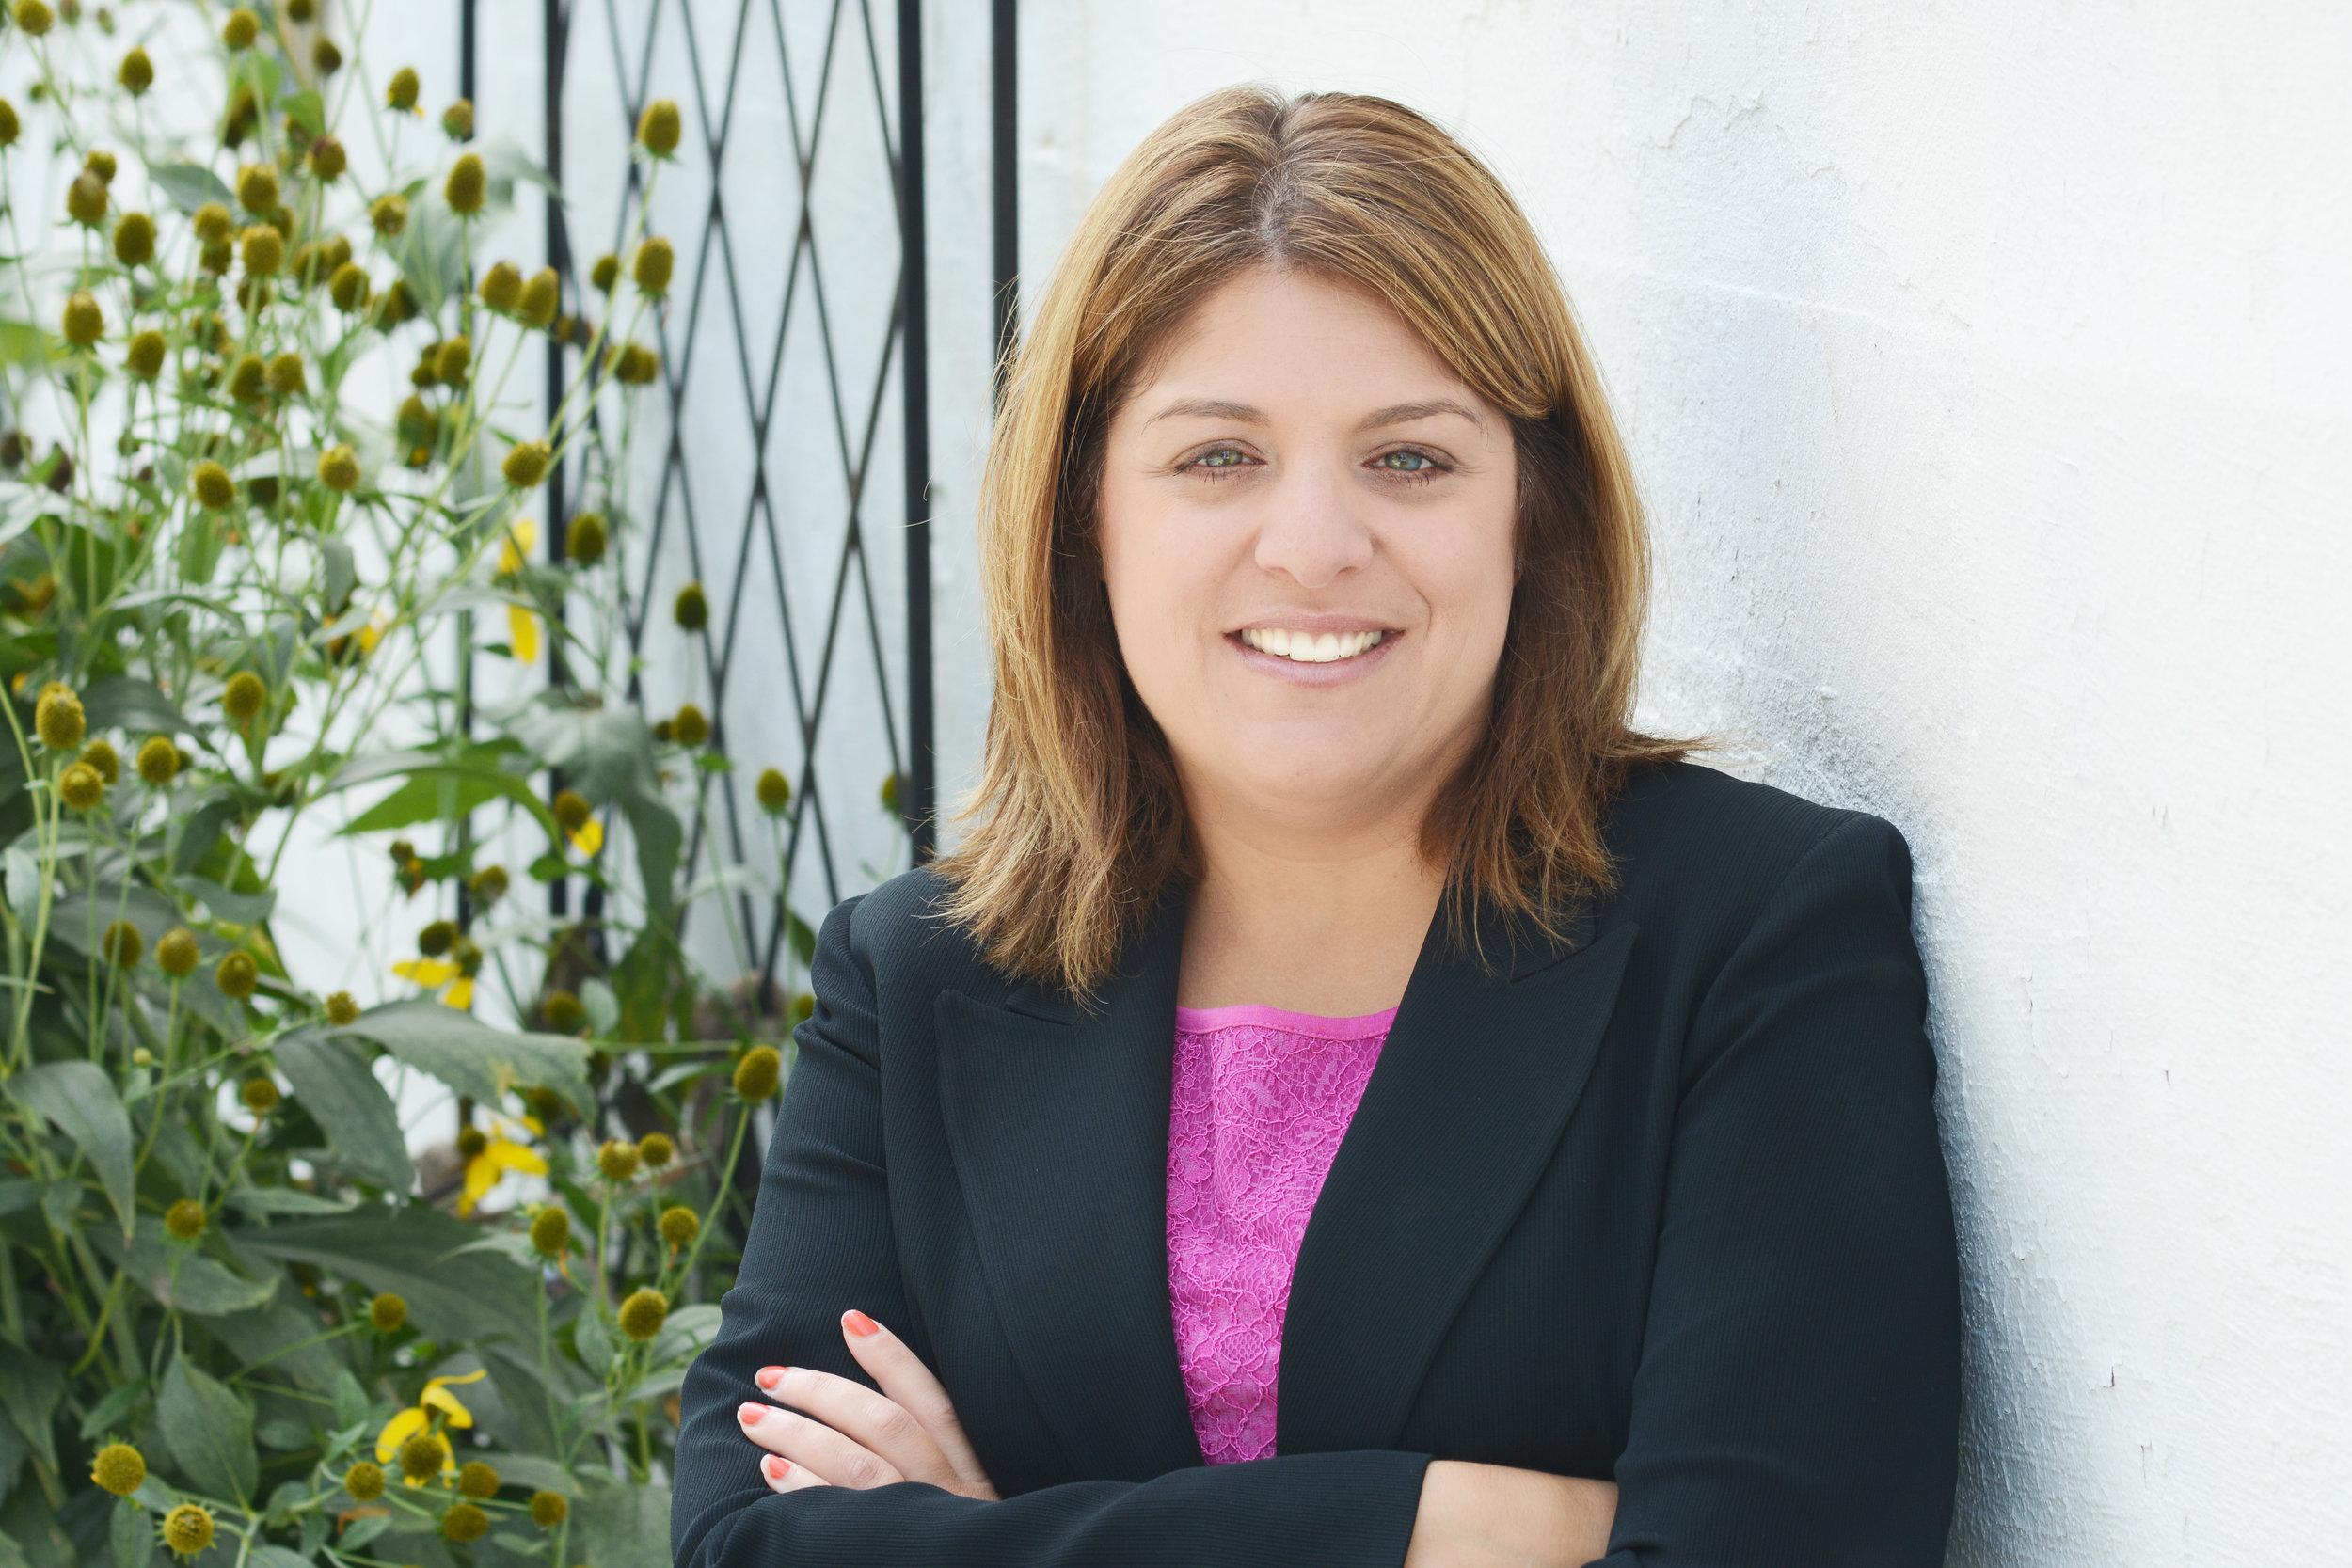 Chrissie Juliano, MPP